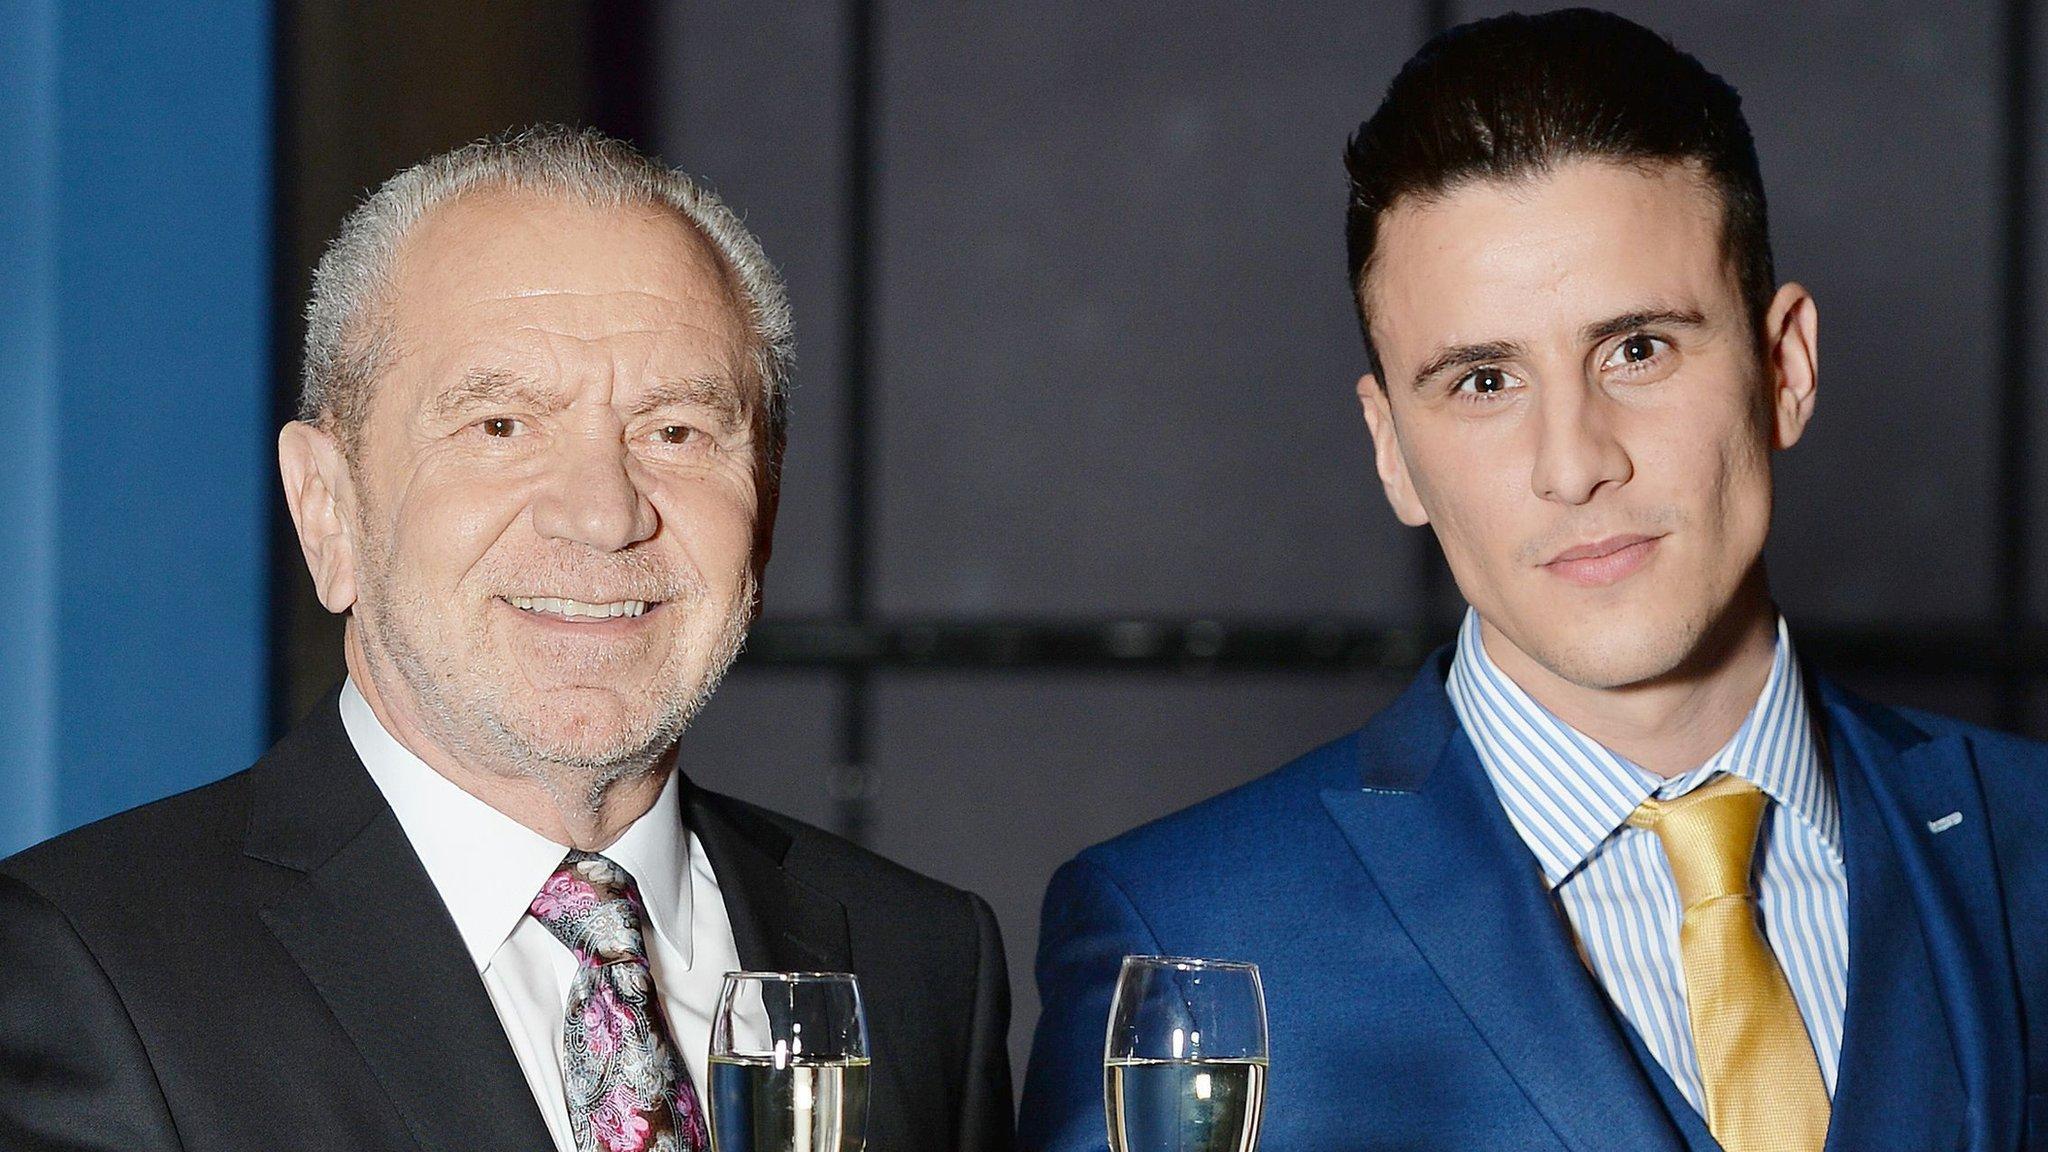 Lord Sugar splits from Apprentice winner